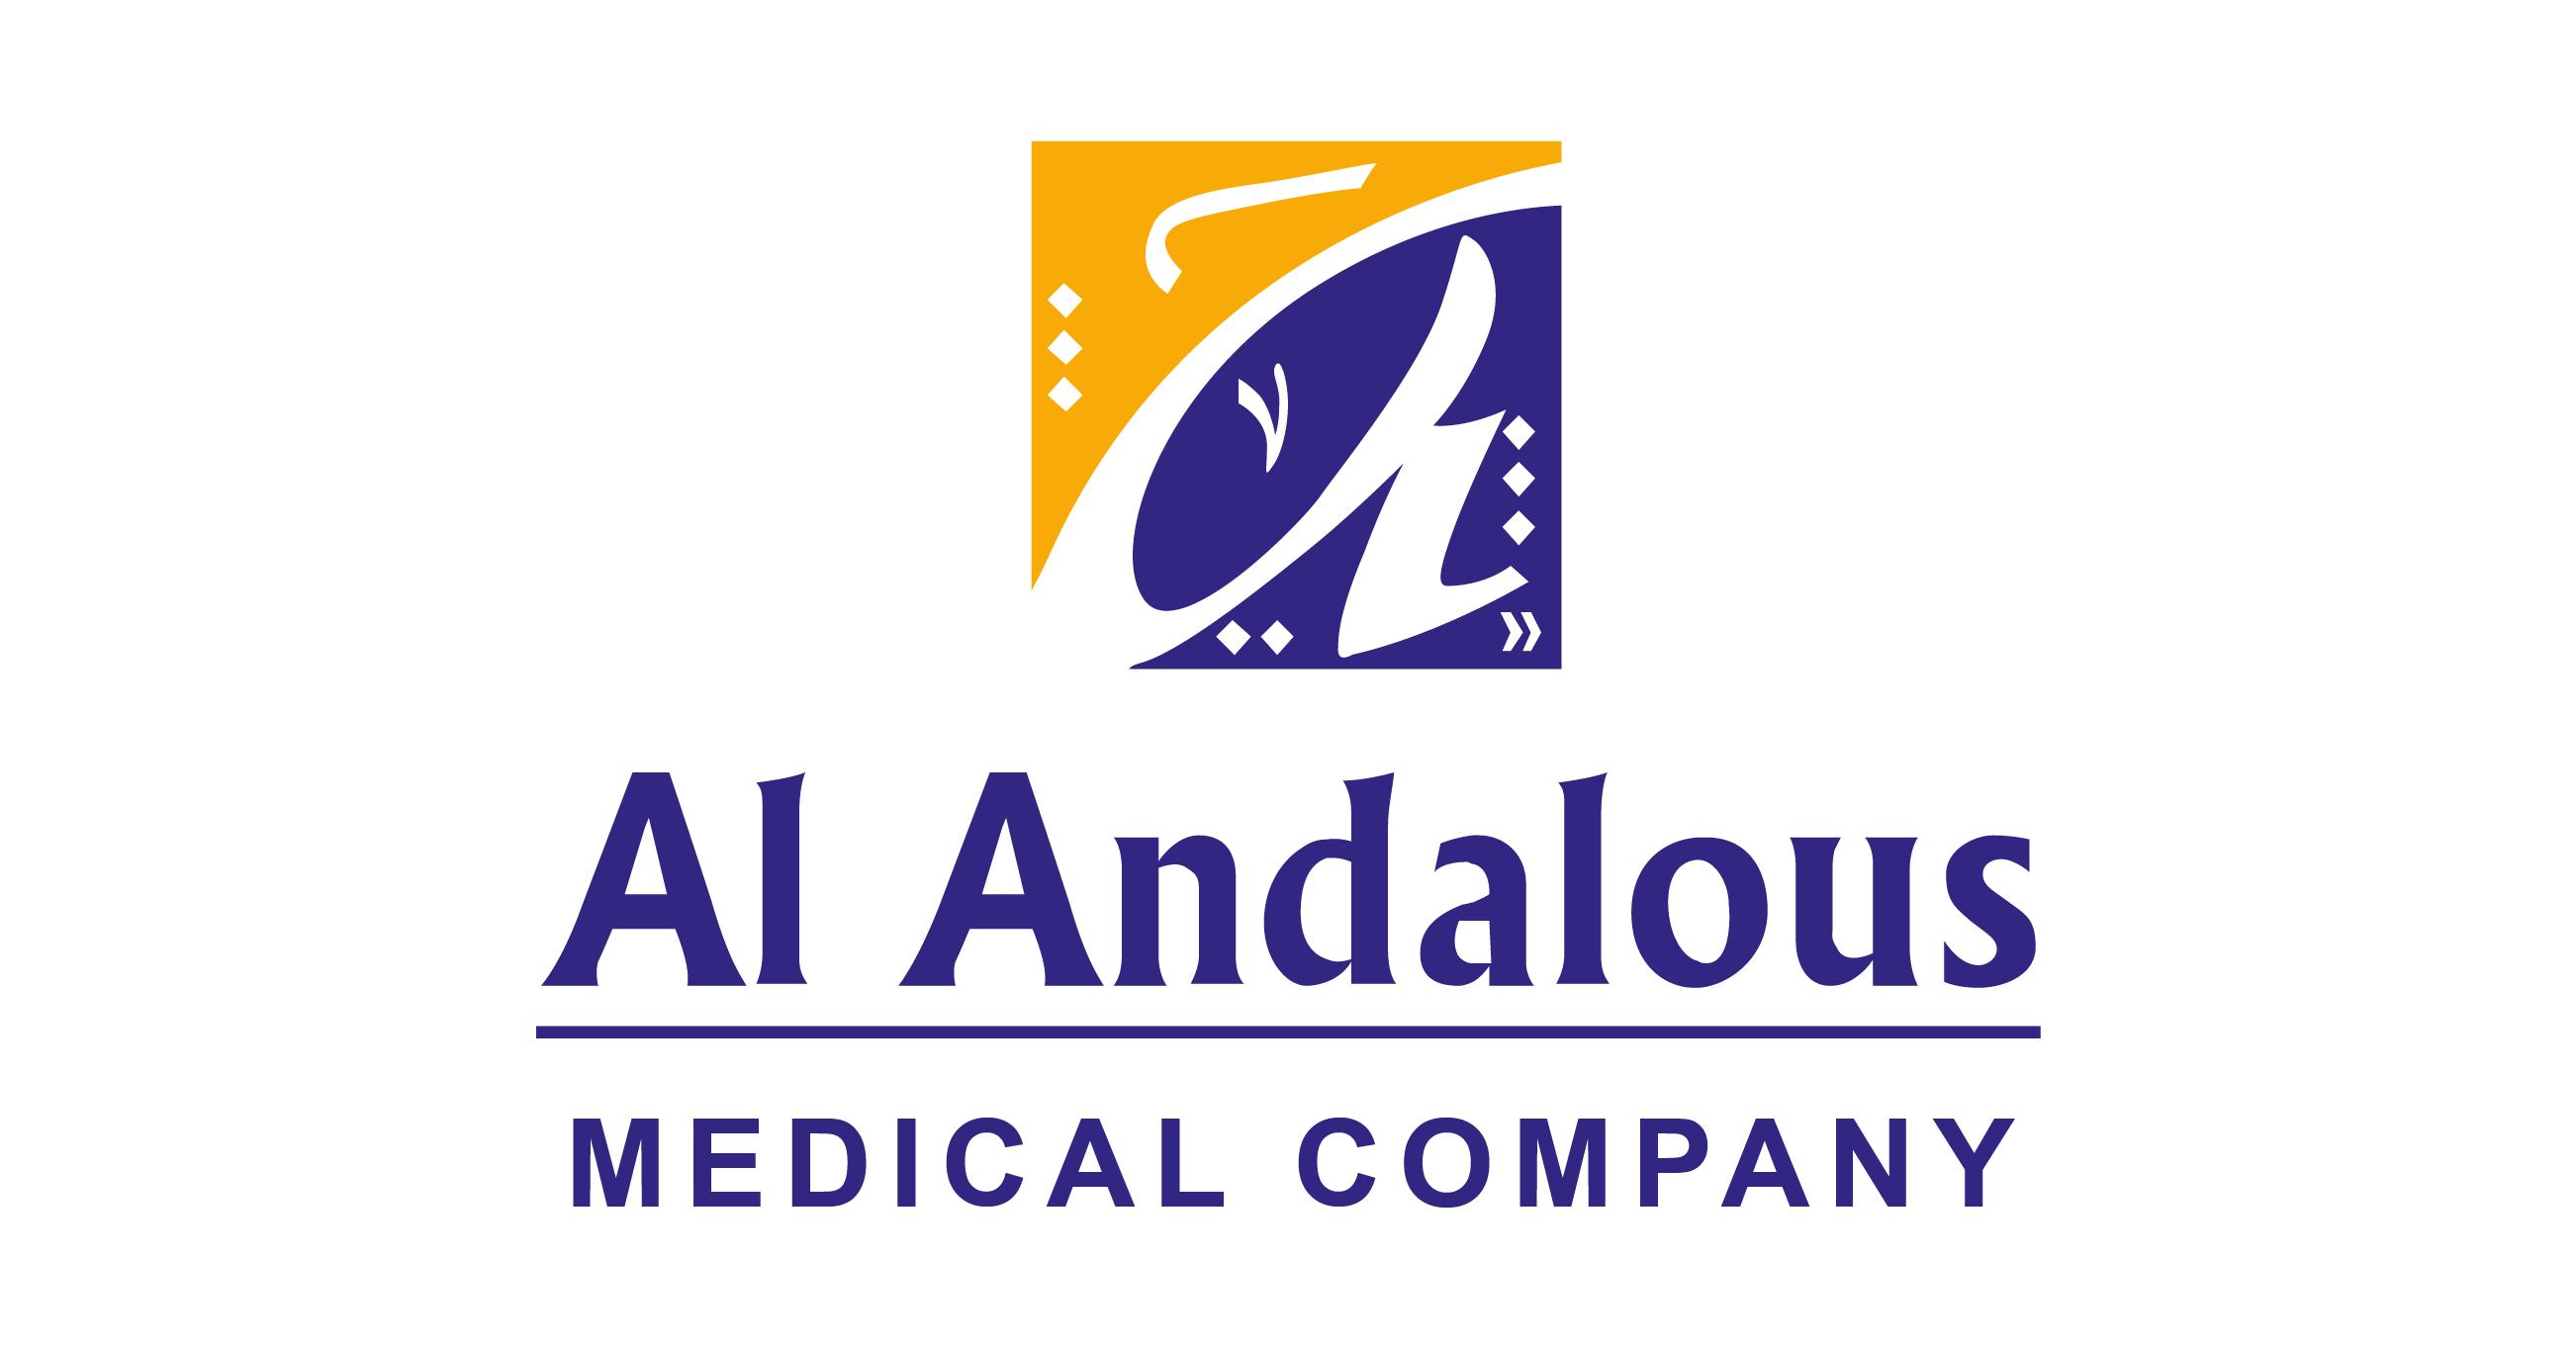 Job: Raw Material Senior Analyst at Al Andalous Medical Company in Giza, Egypt